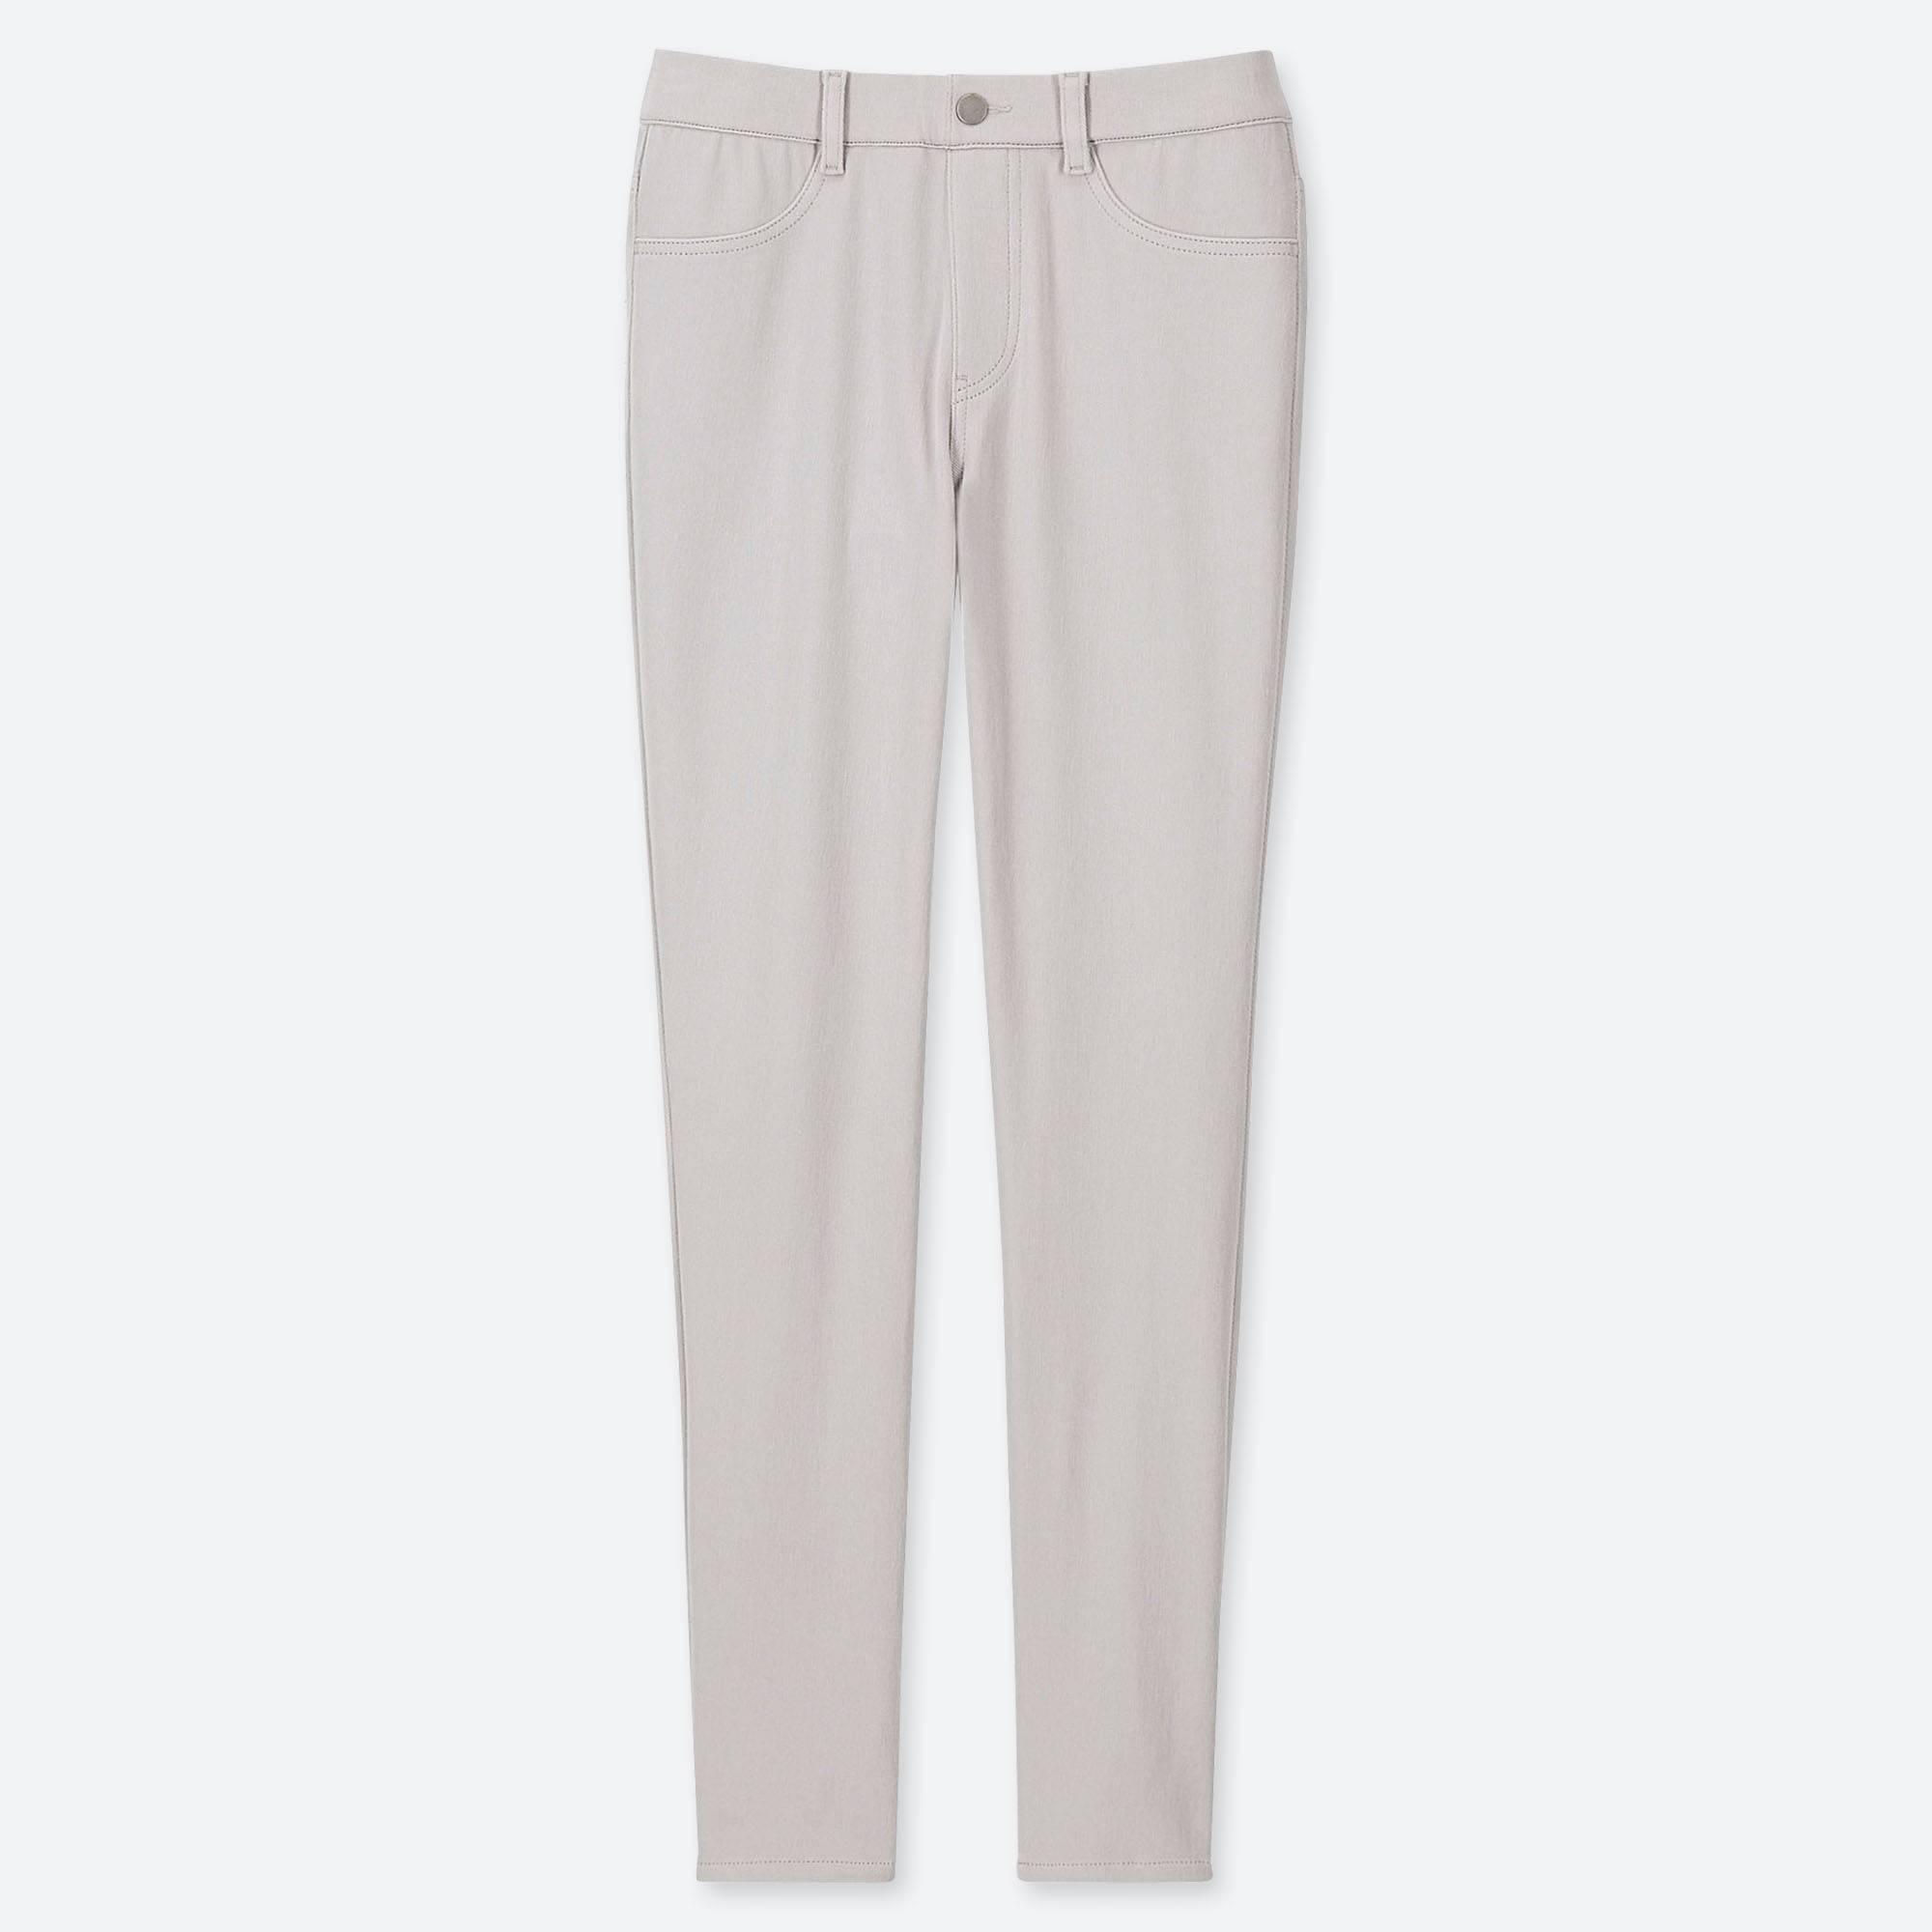 0c6249d16a8dc7 Lyst - Uniqlo Women Ultra Stretch LEGGINGS Pants in Gray